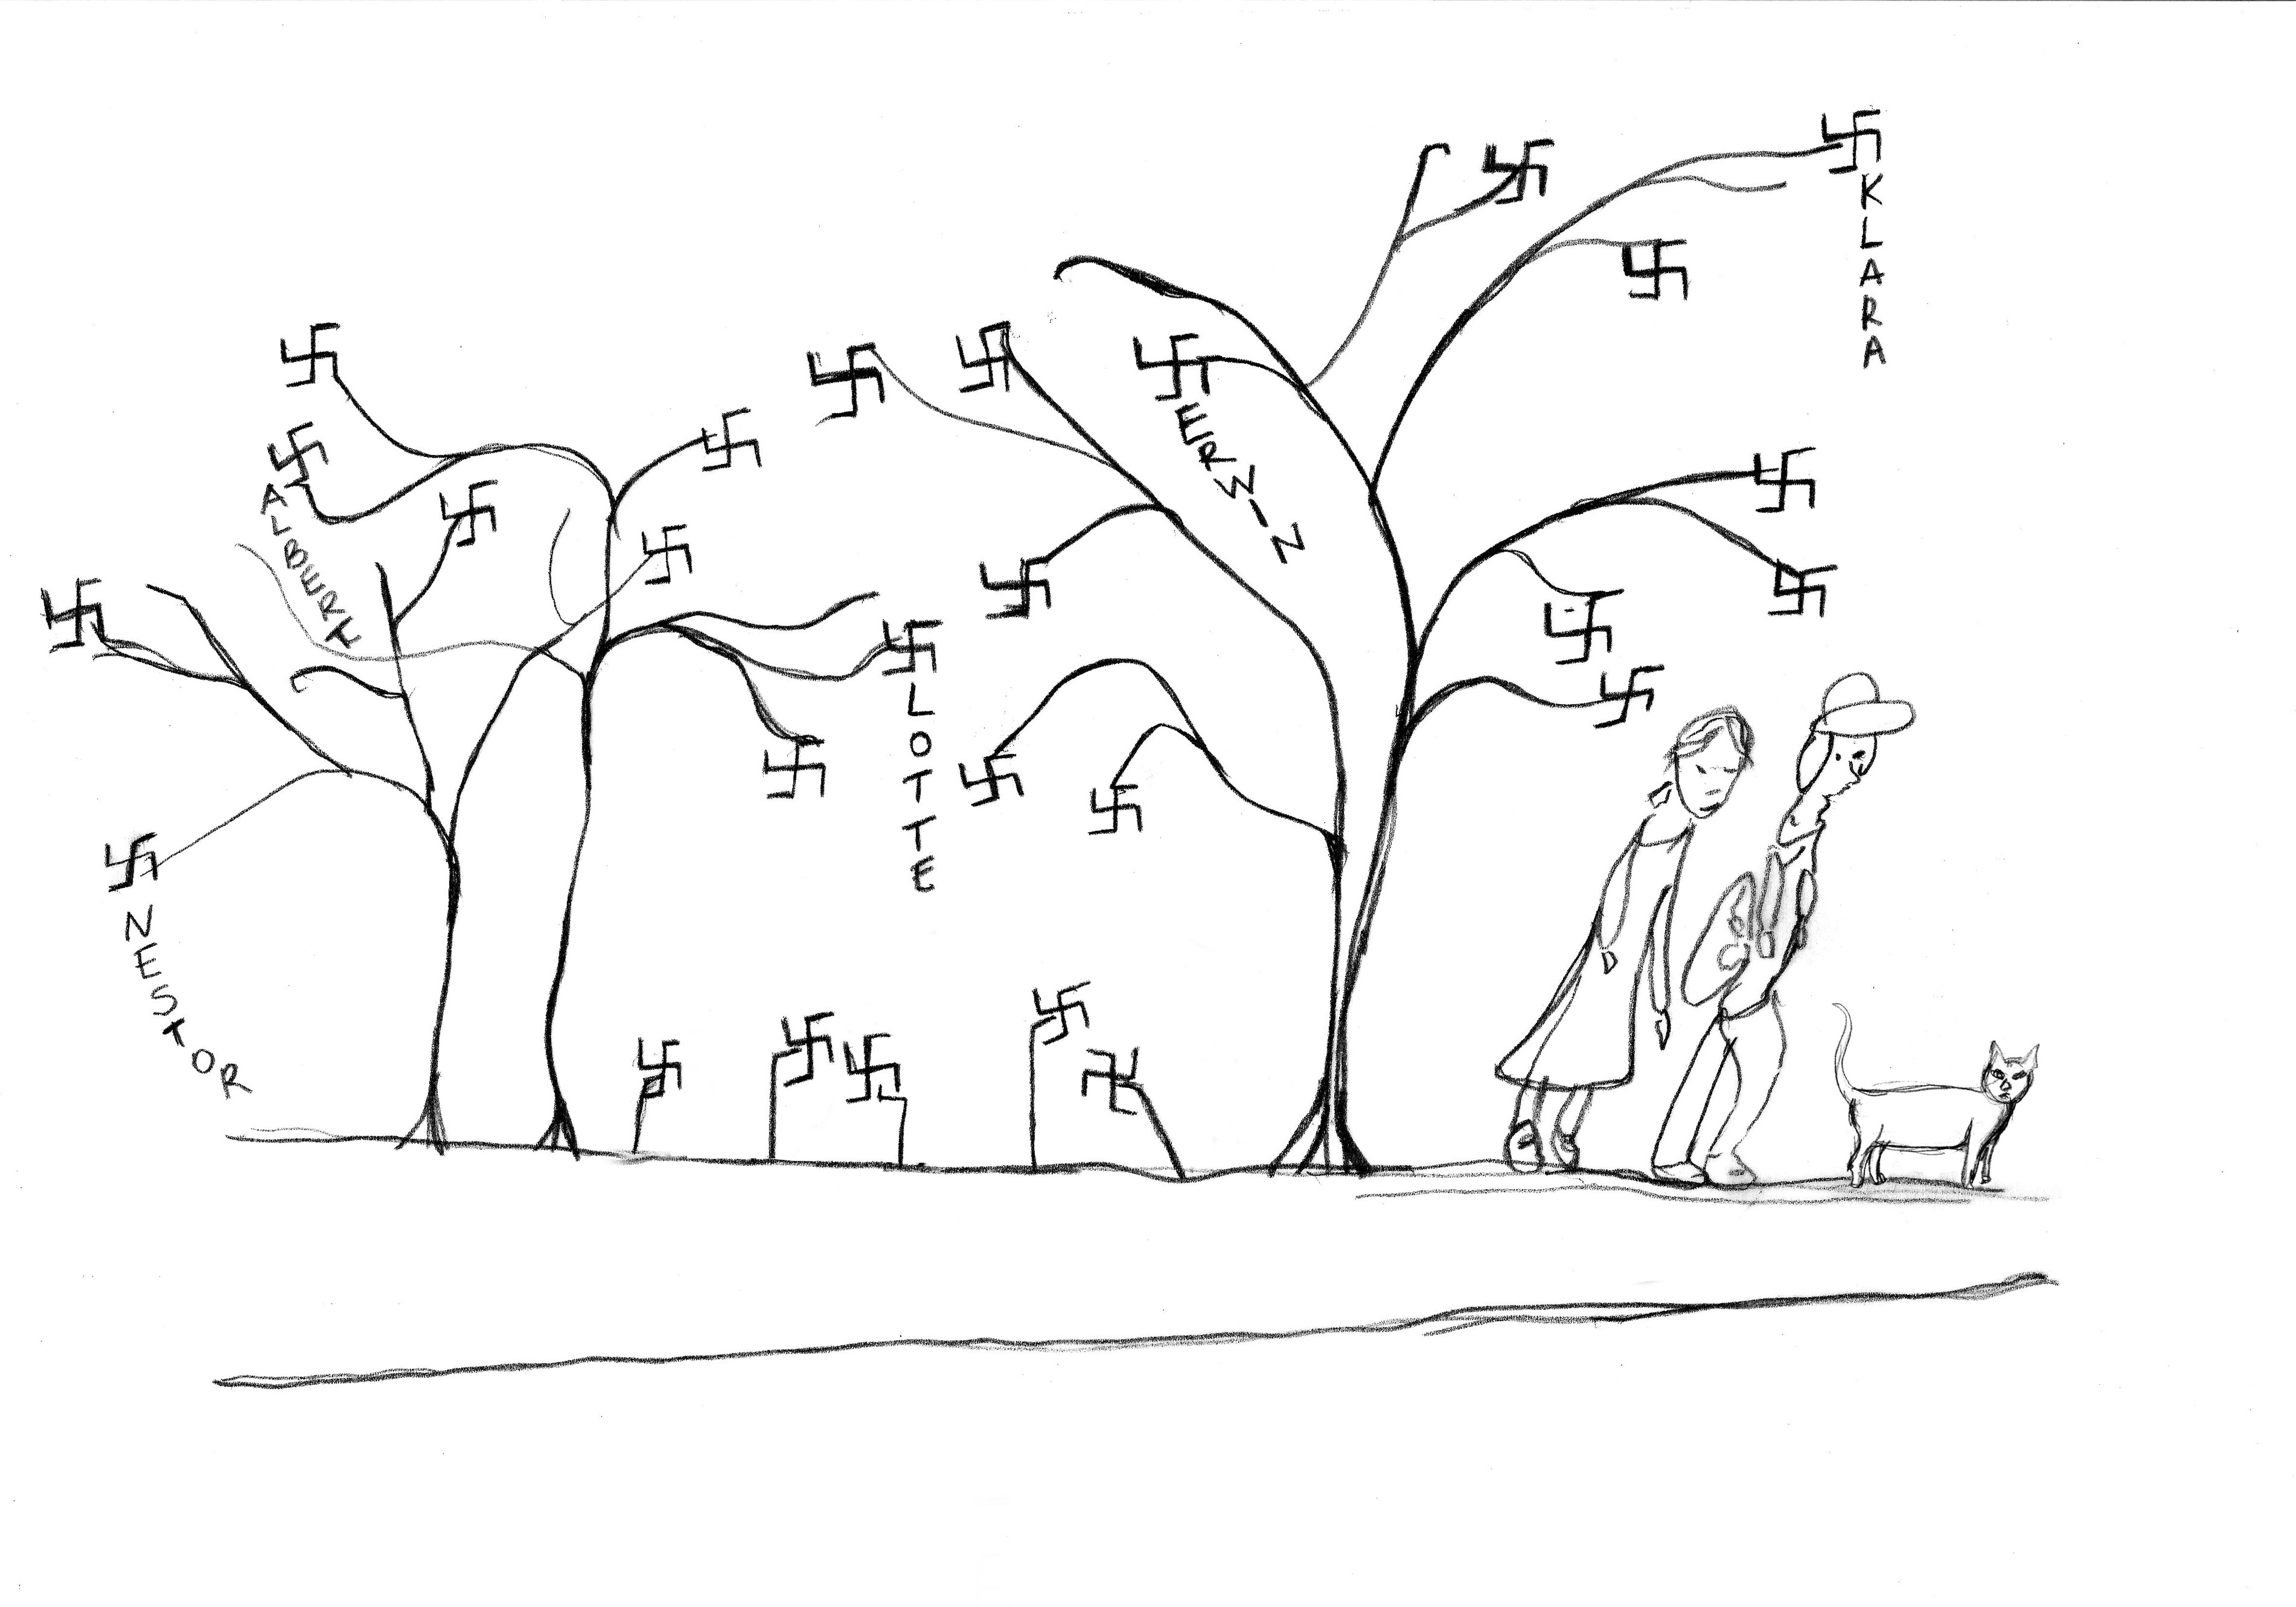 10. Lotte'nin karta çizdiği resim